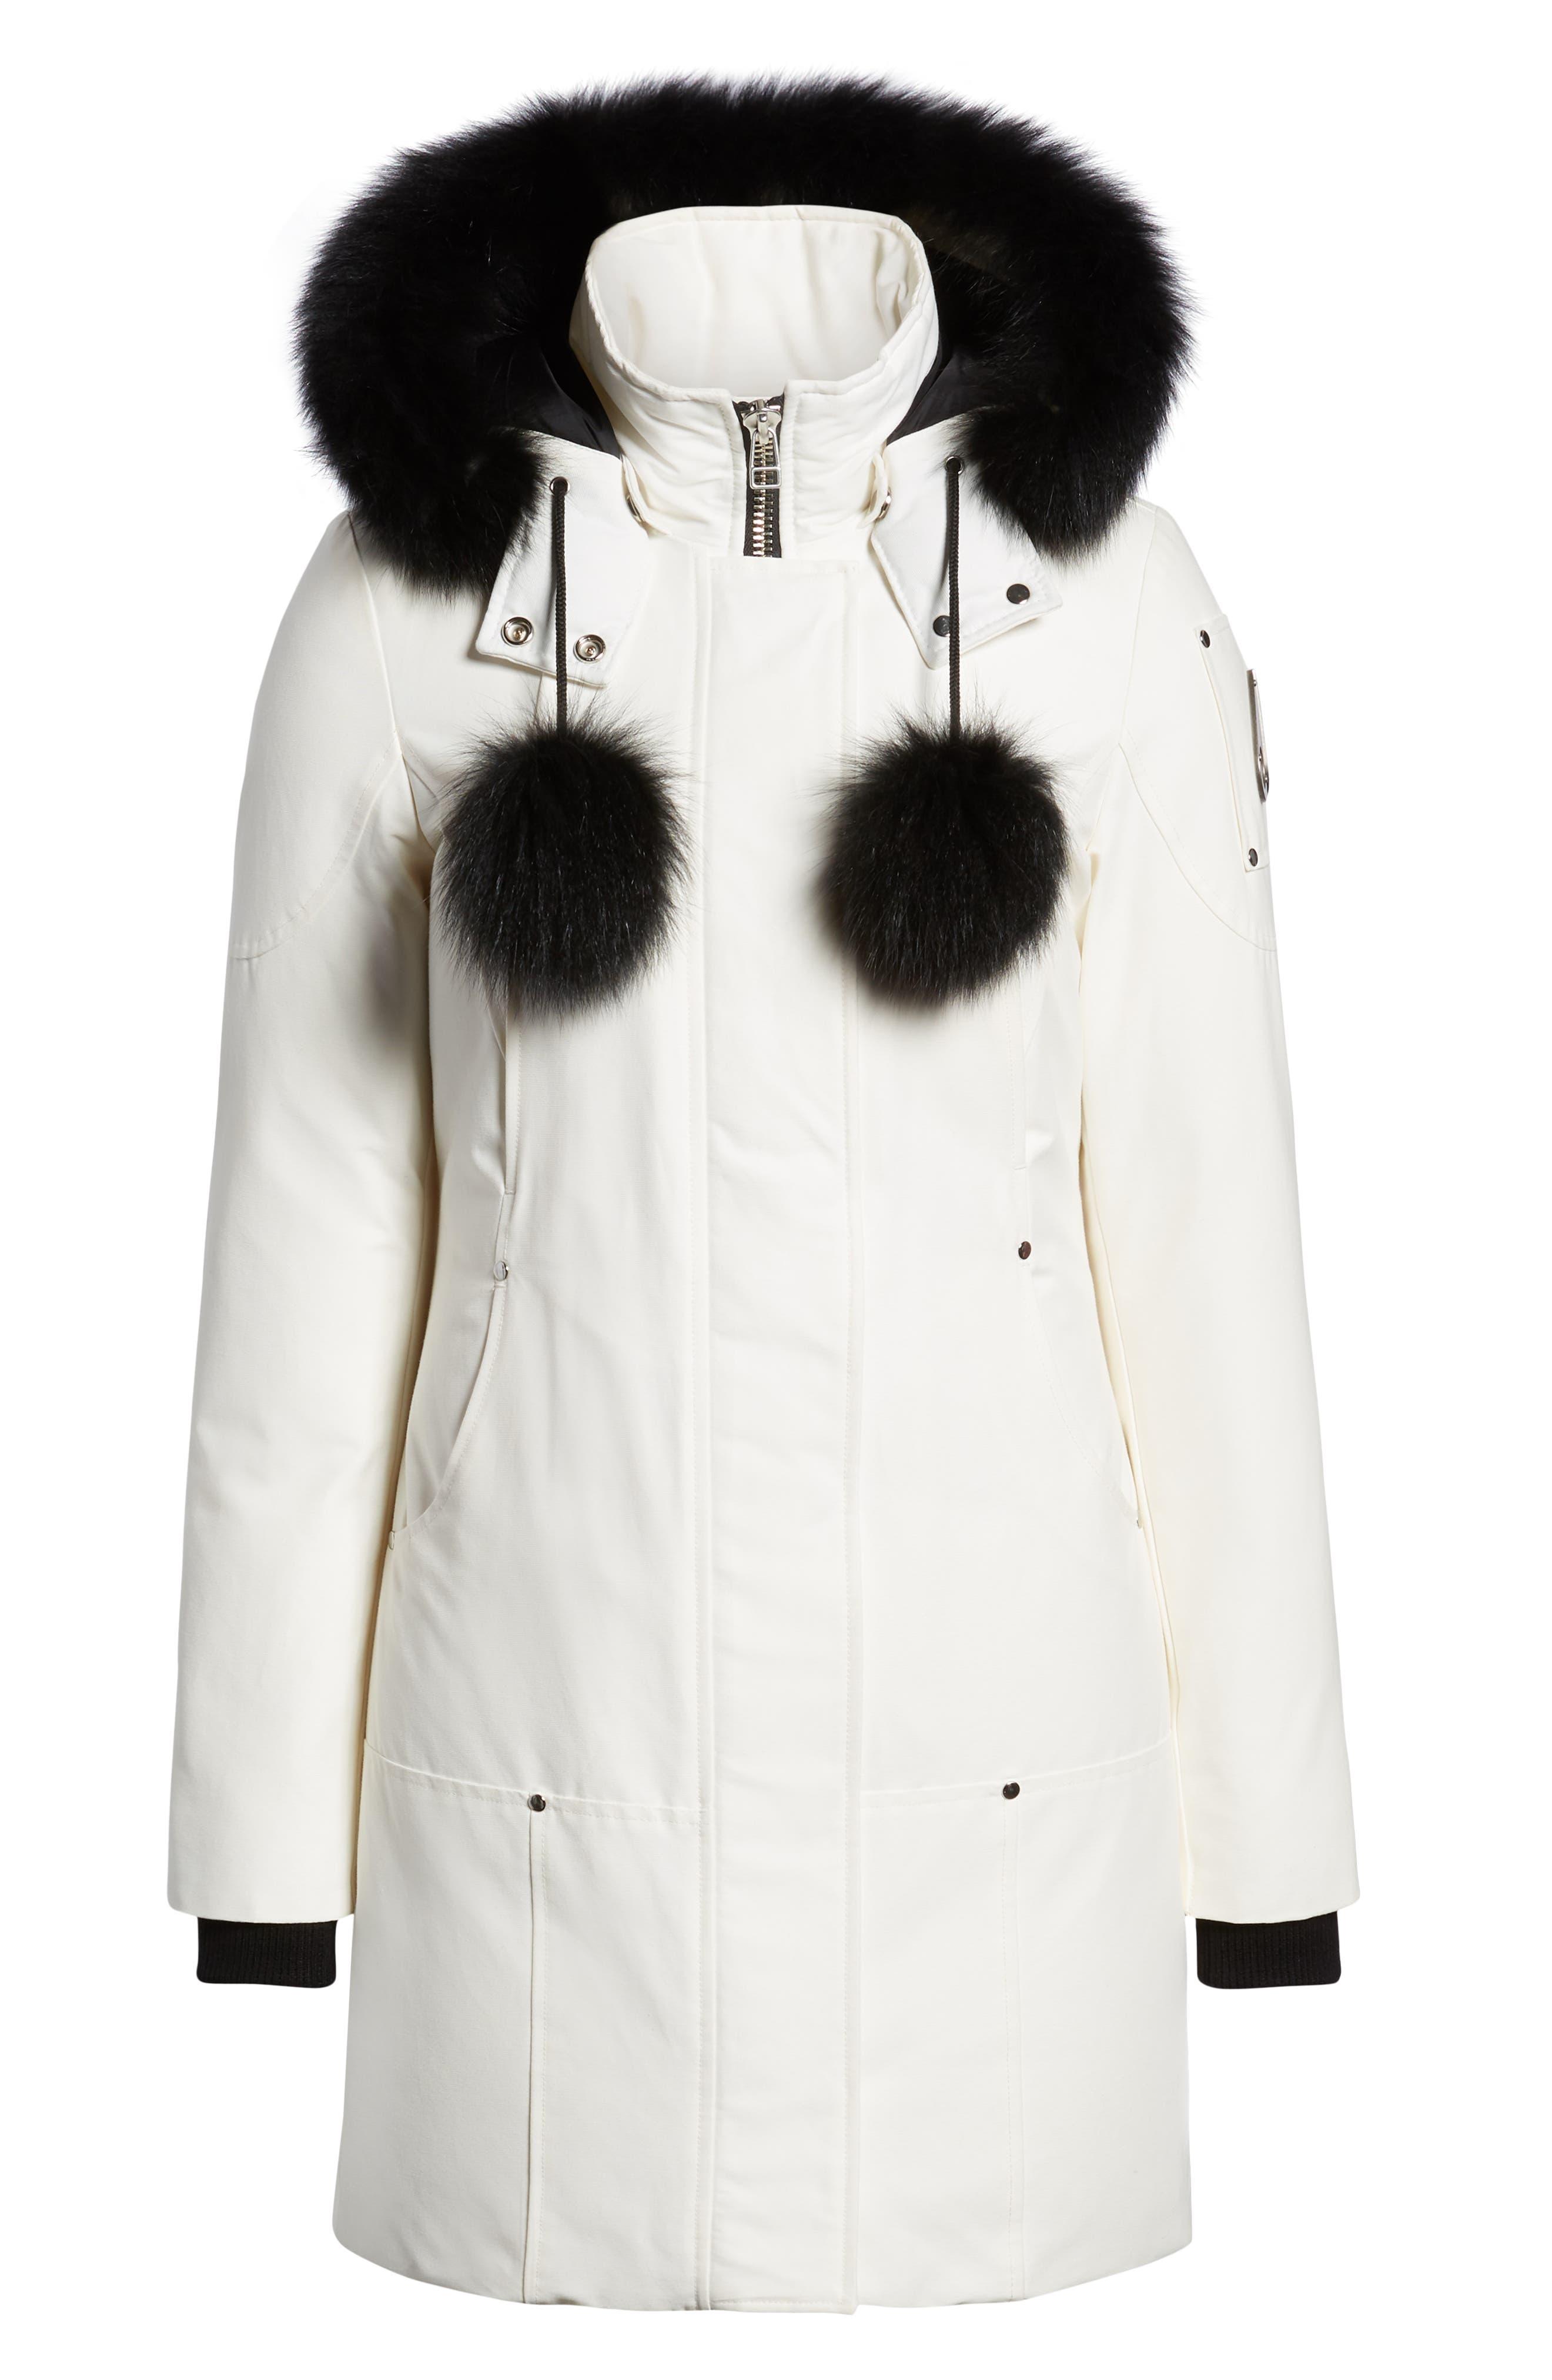 'Stirling' Down Parka with Genuine Fox Fur Trim,                             Alternate thumbnail 6, color,                             SNOW WHITE/ BLACK FOX